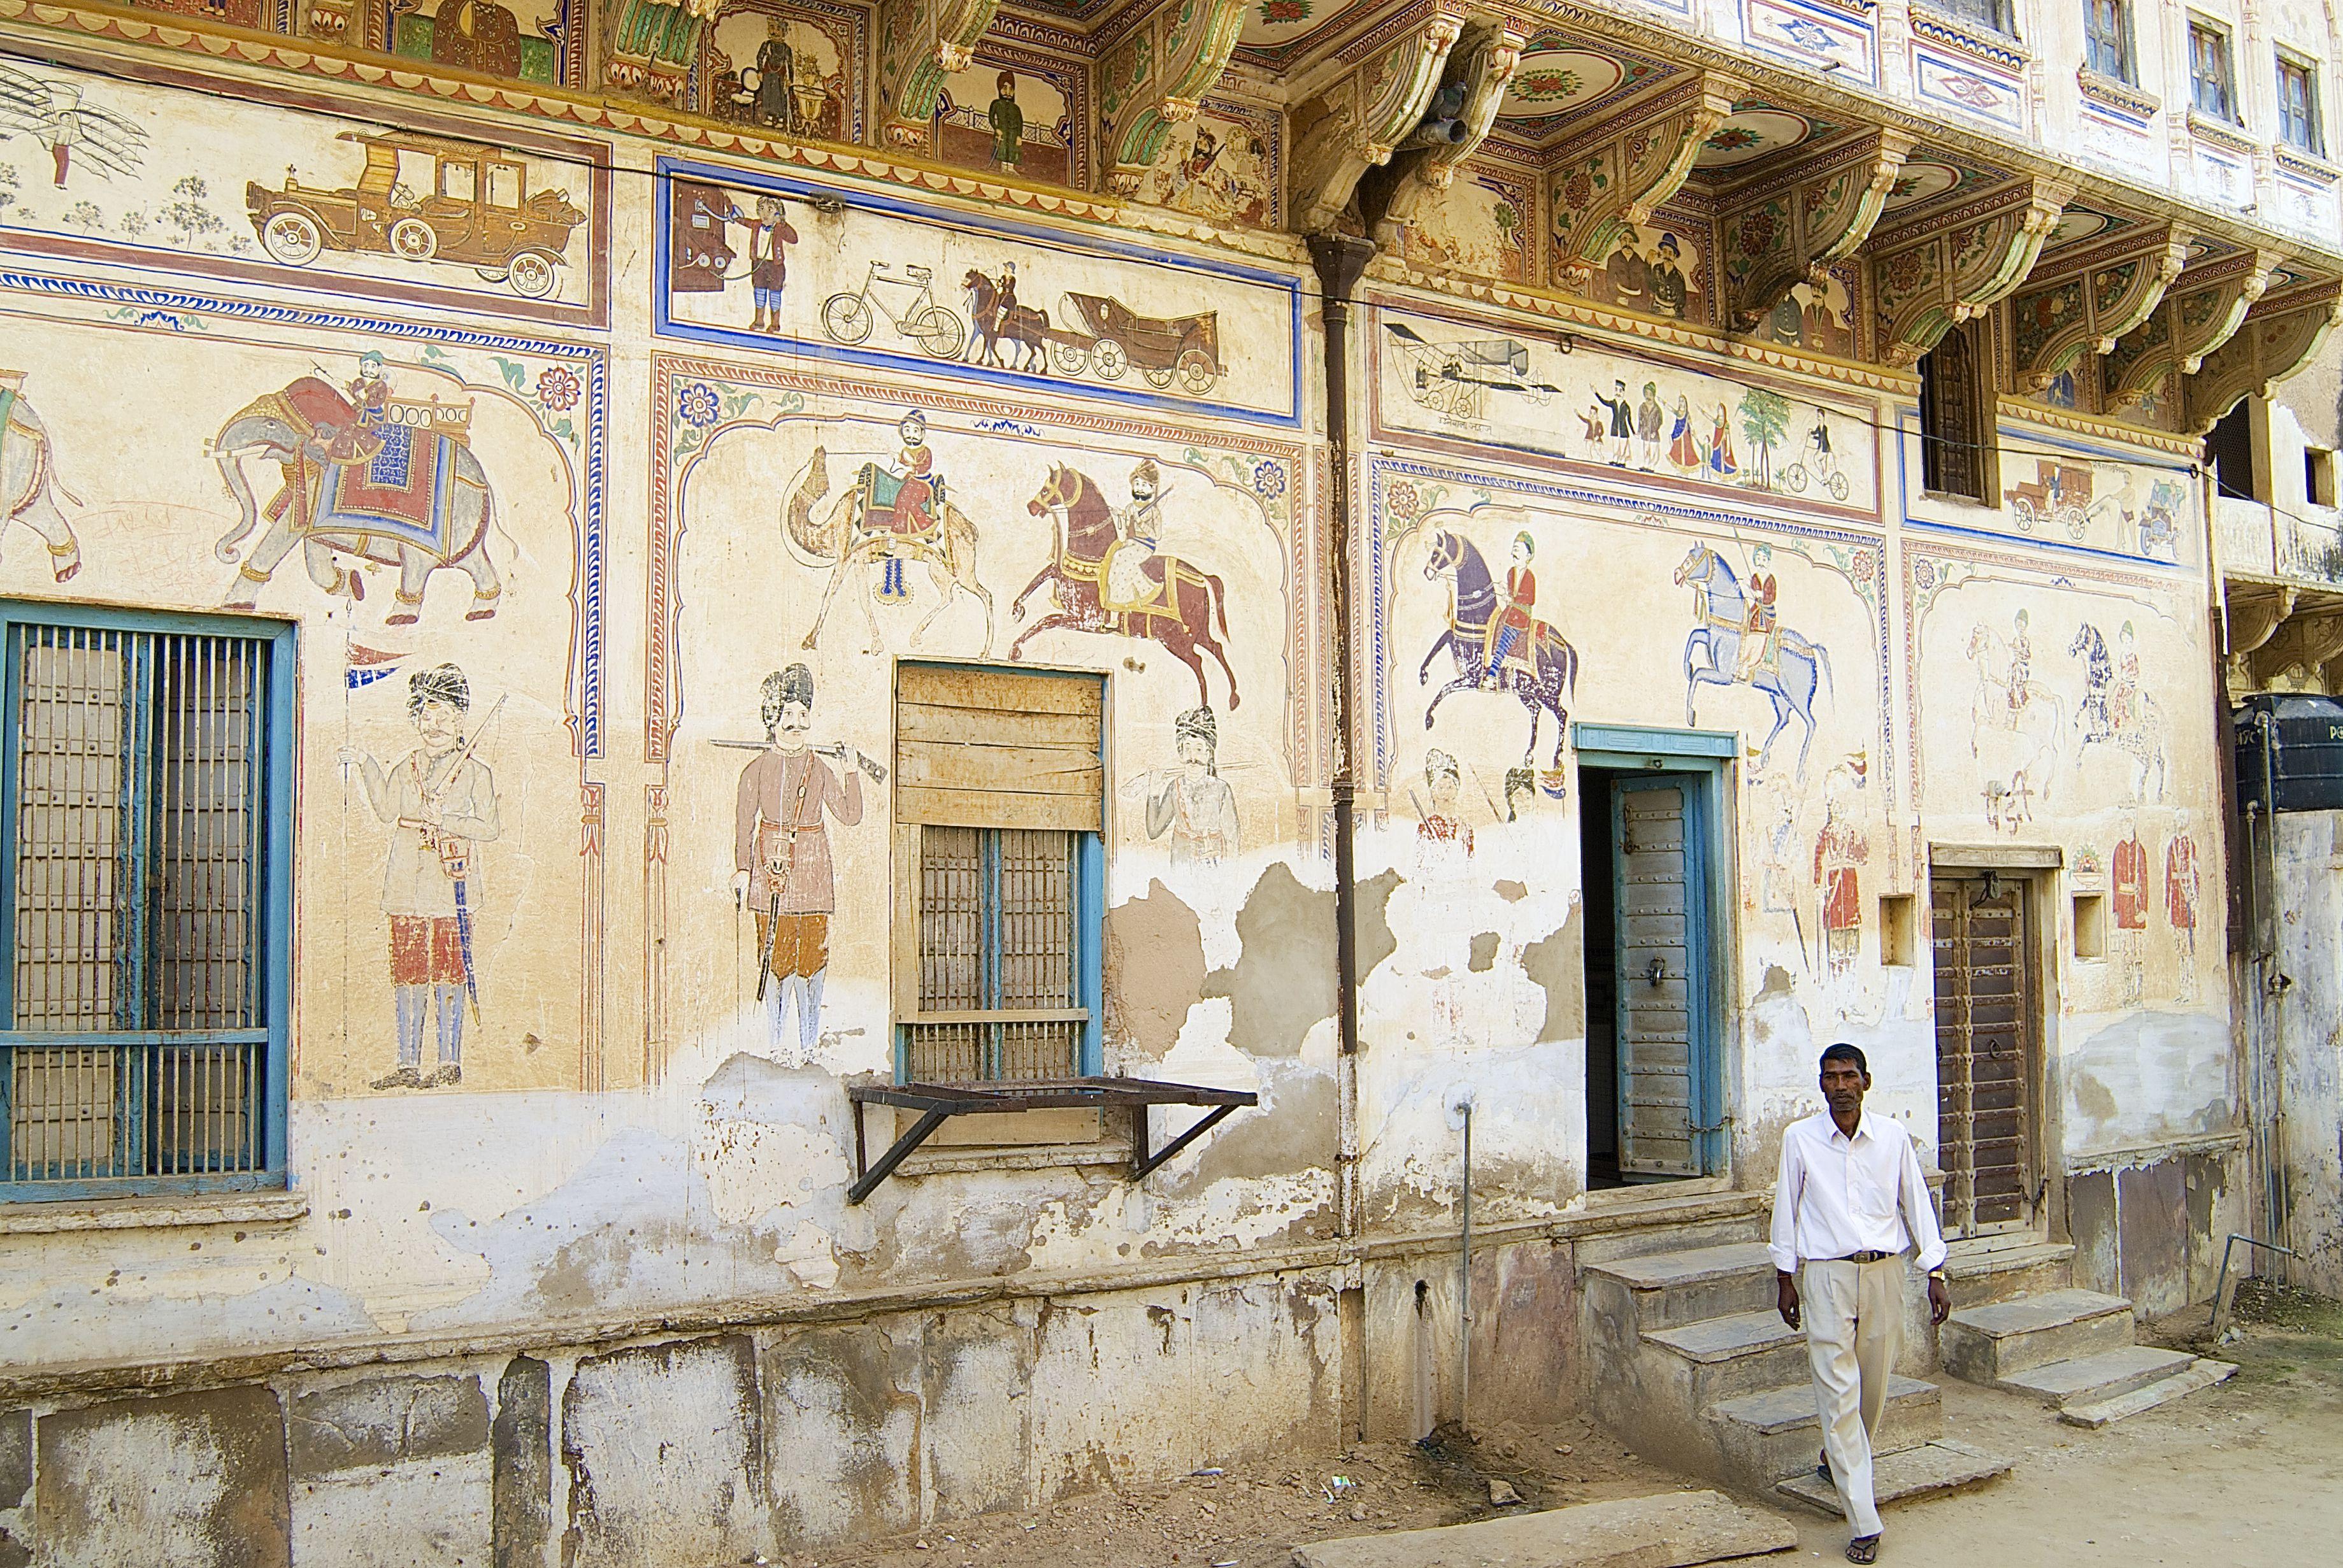 Painted haveli in Mandawa.